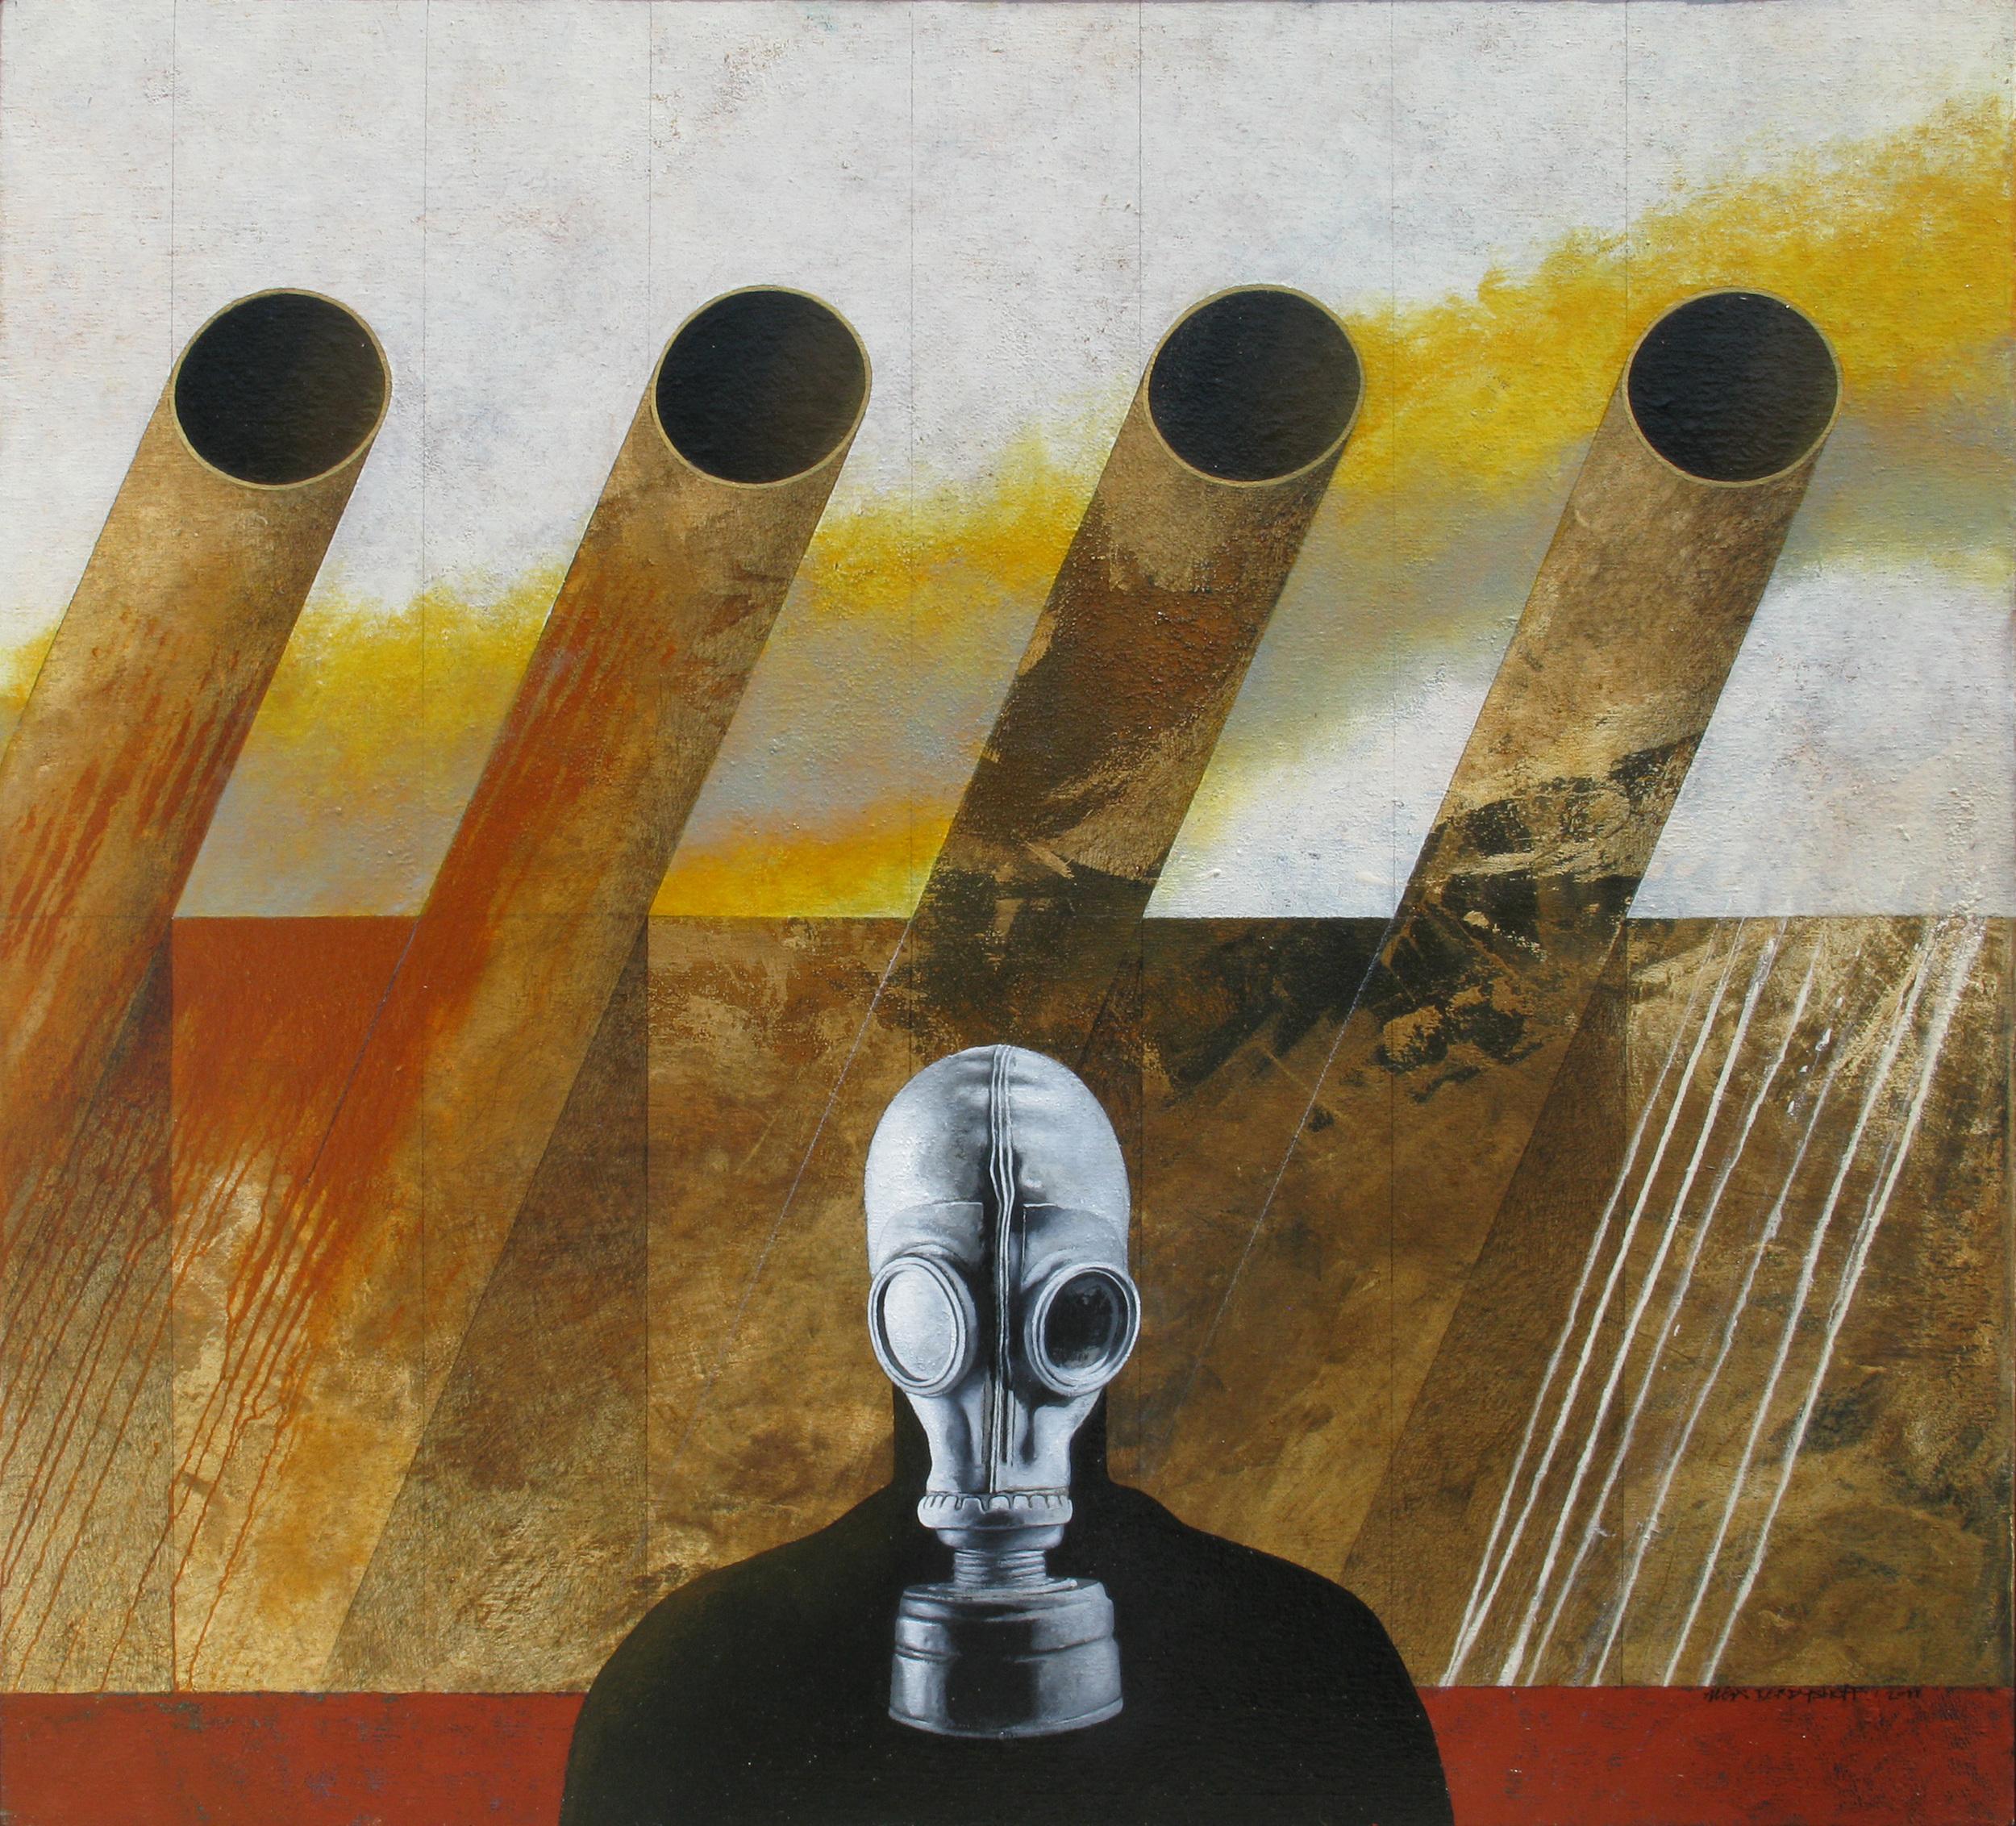 Ultima Ratio, oil on canvas, 110x120 cm, 2011